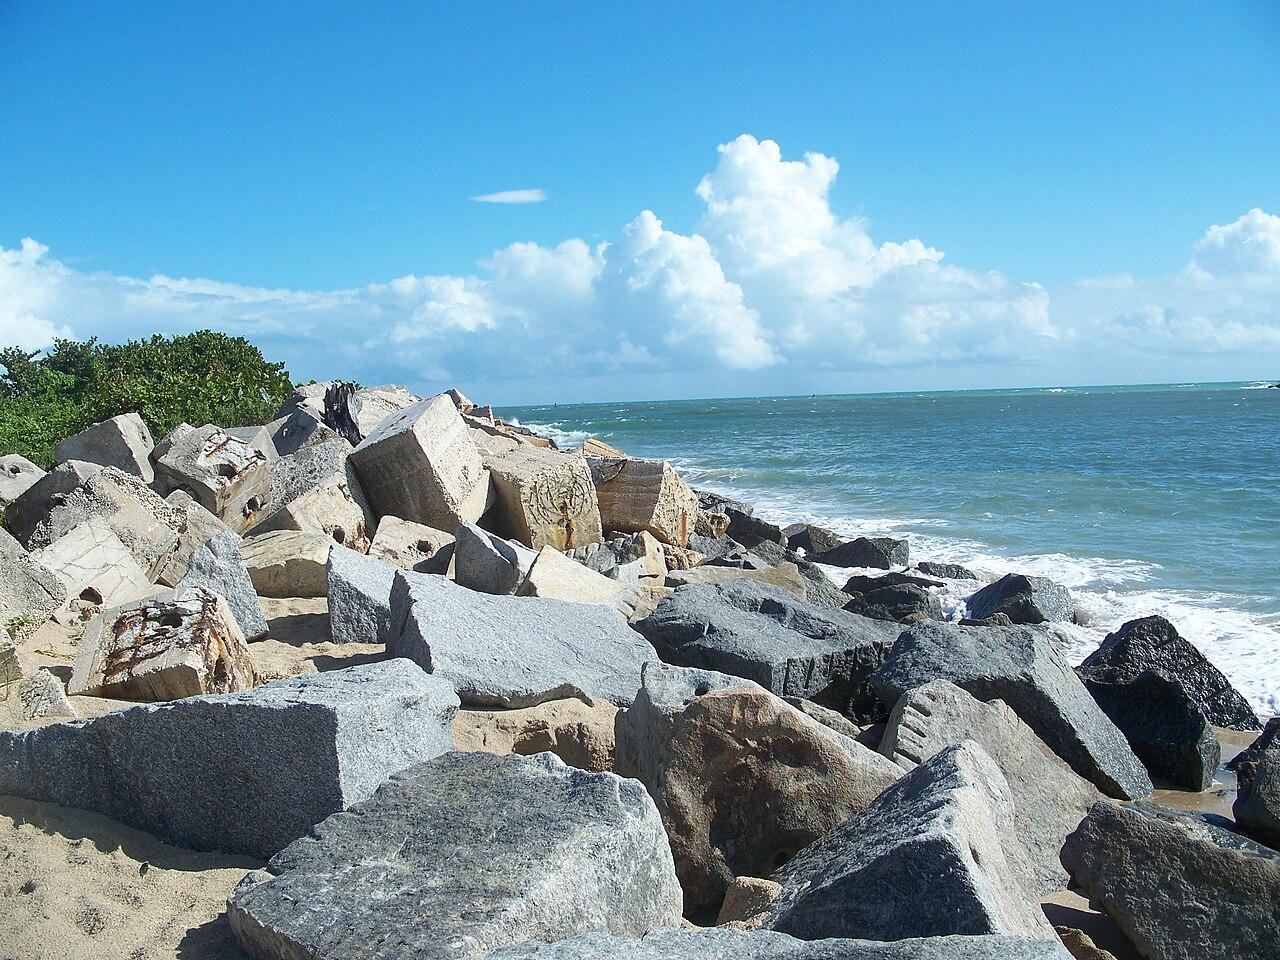 File:Ft Pierce FL Fort Pierce Inlet SP picnic01.jpg